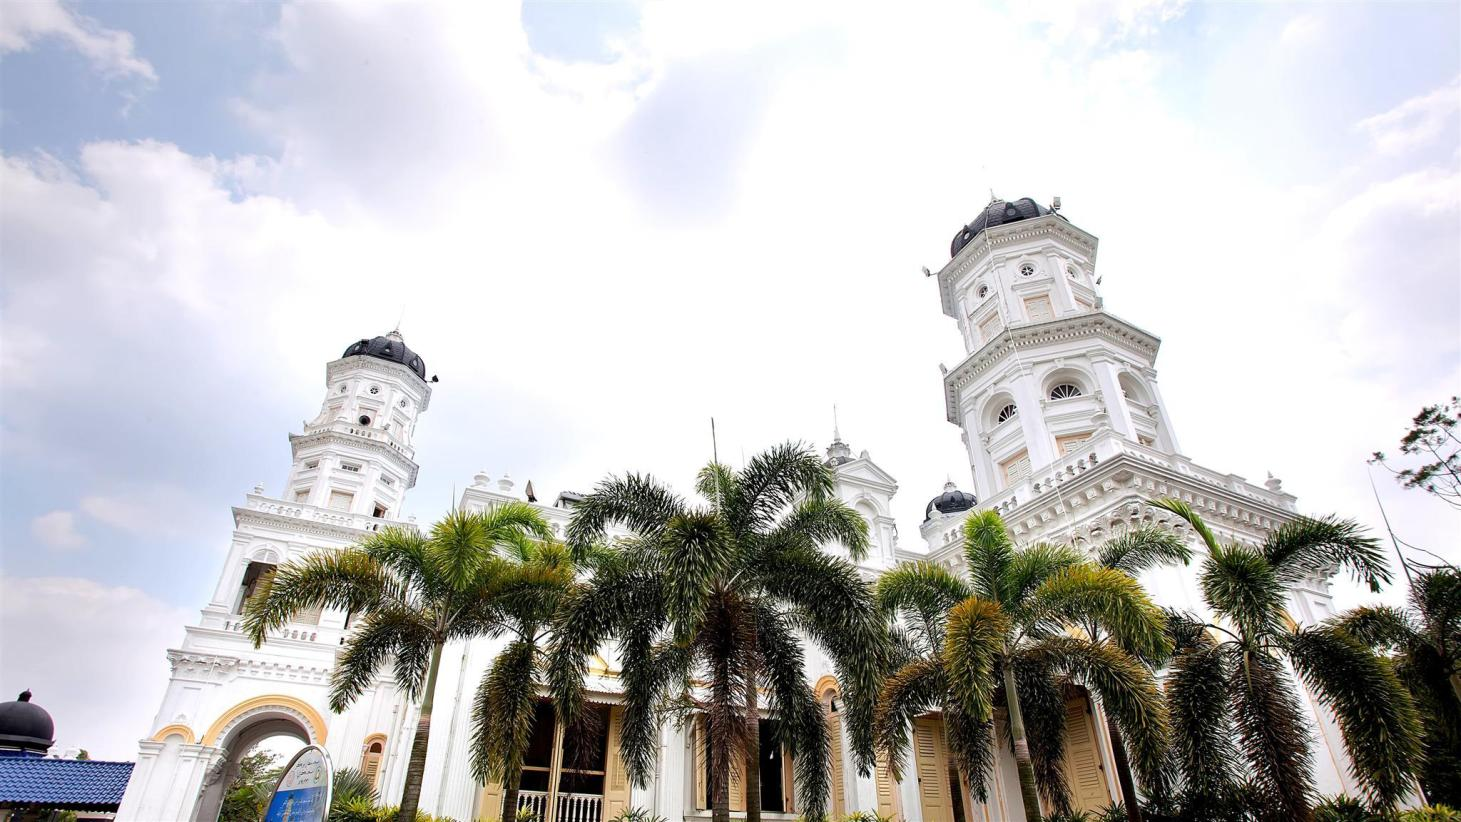 a4a6c319f37f 10 Best Johor Bahru Hotels: HD Photos + Reviews of Hotels in Johor ...